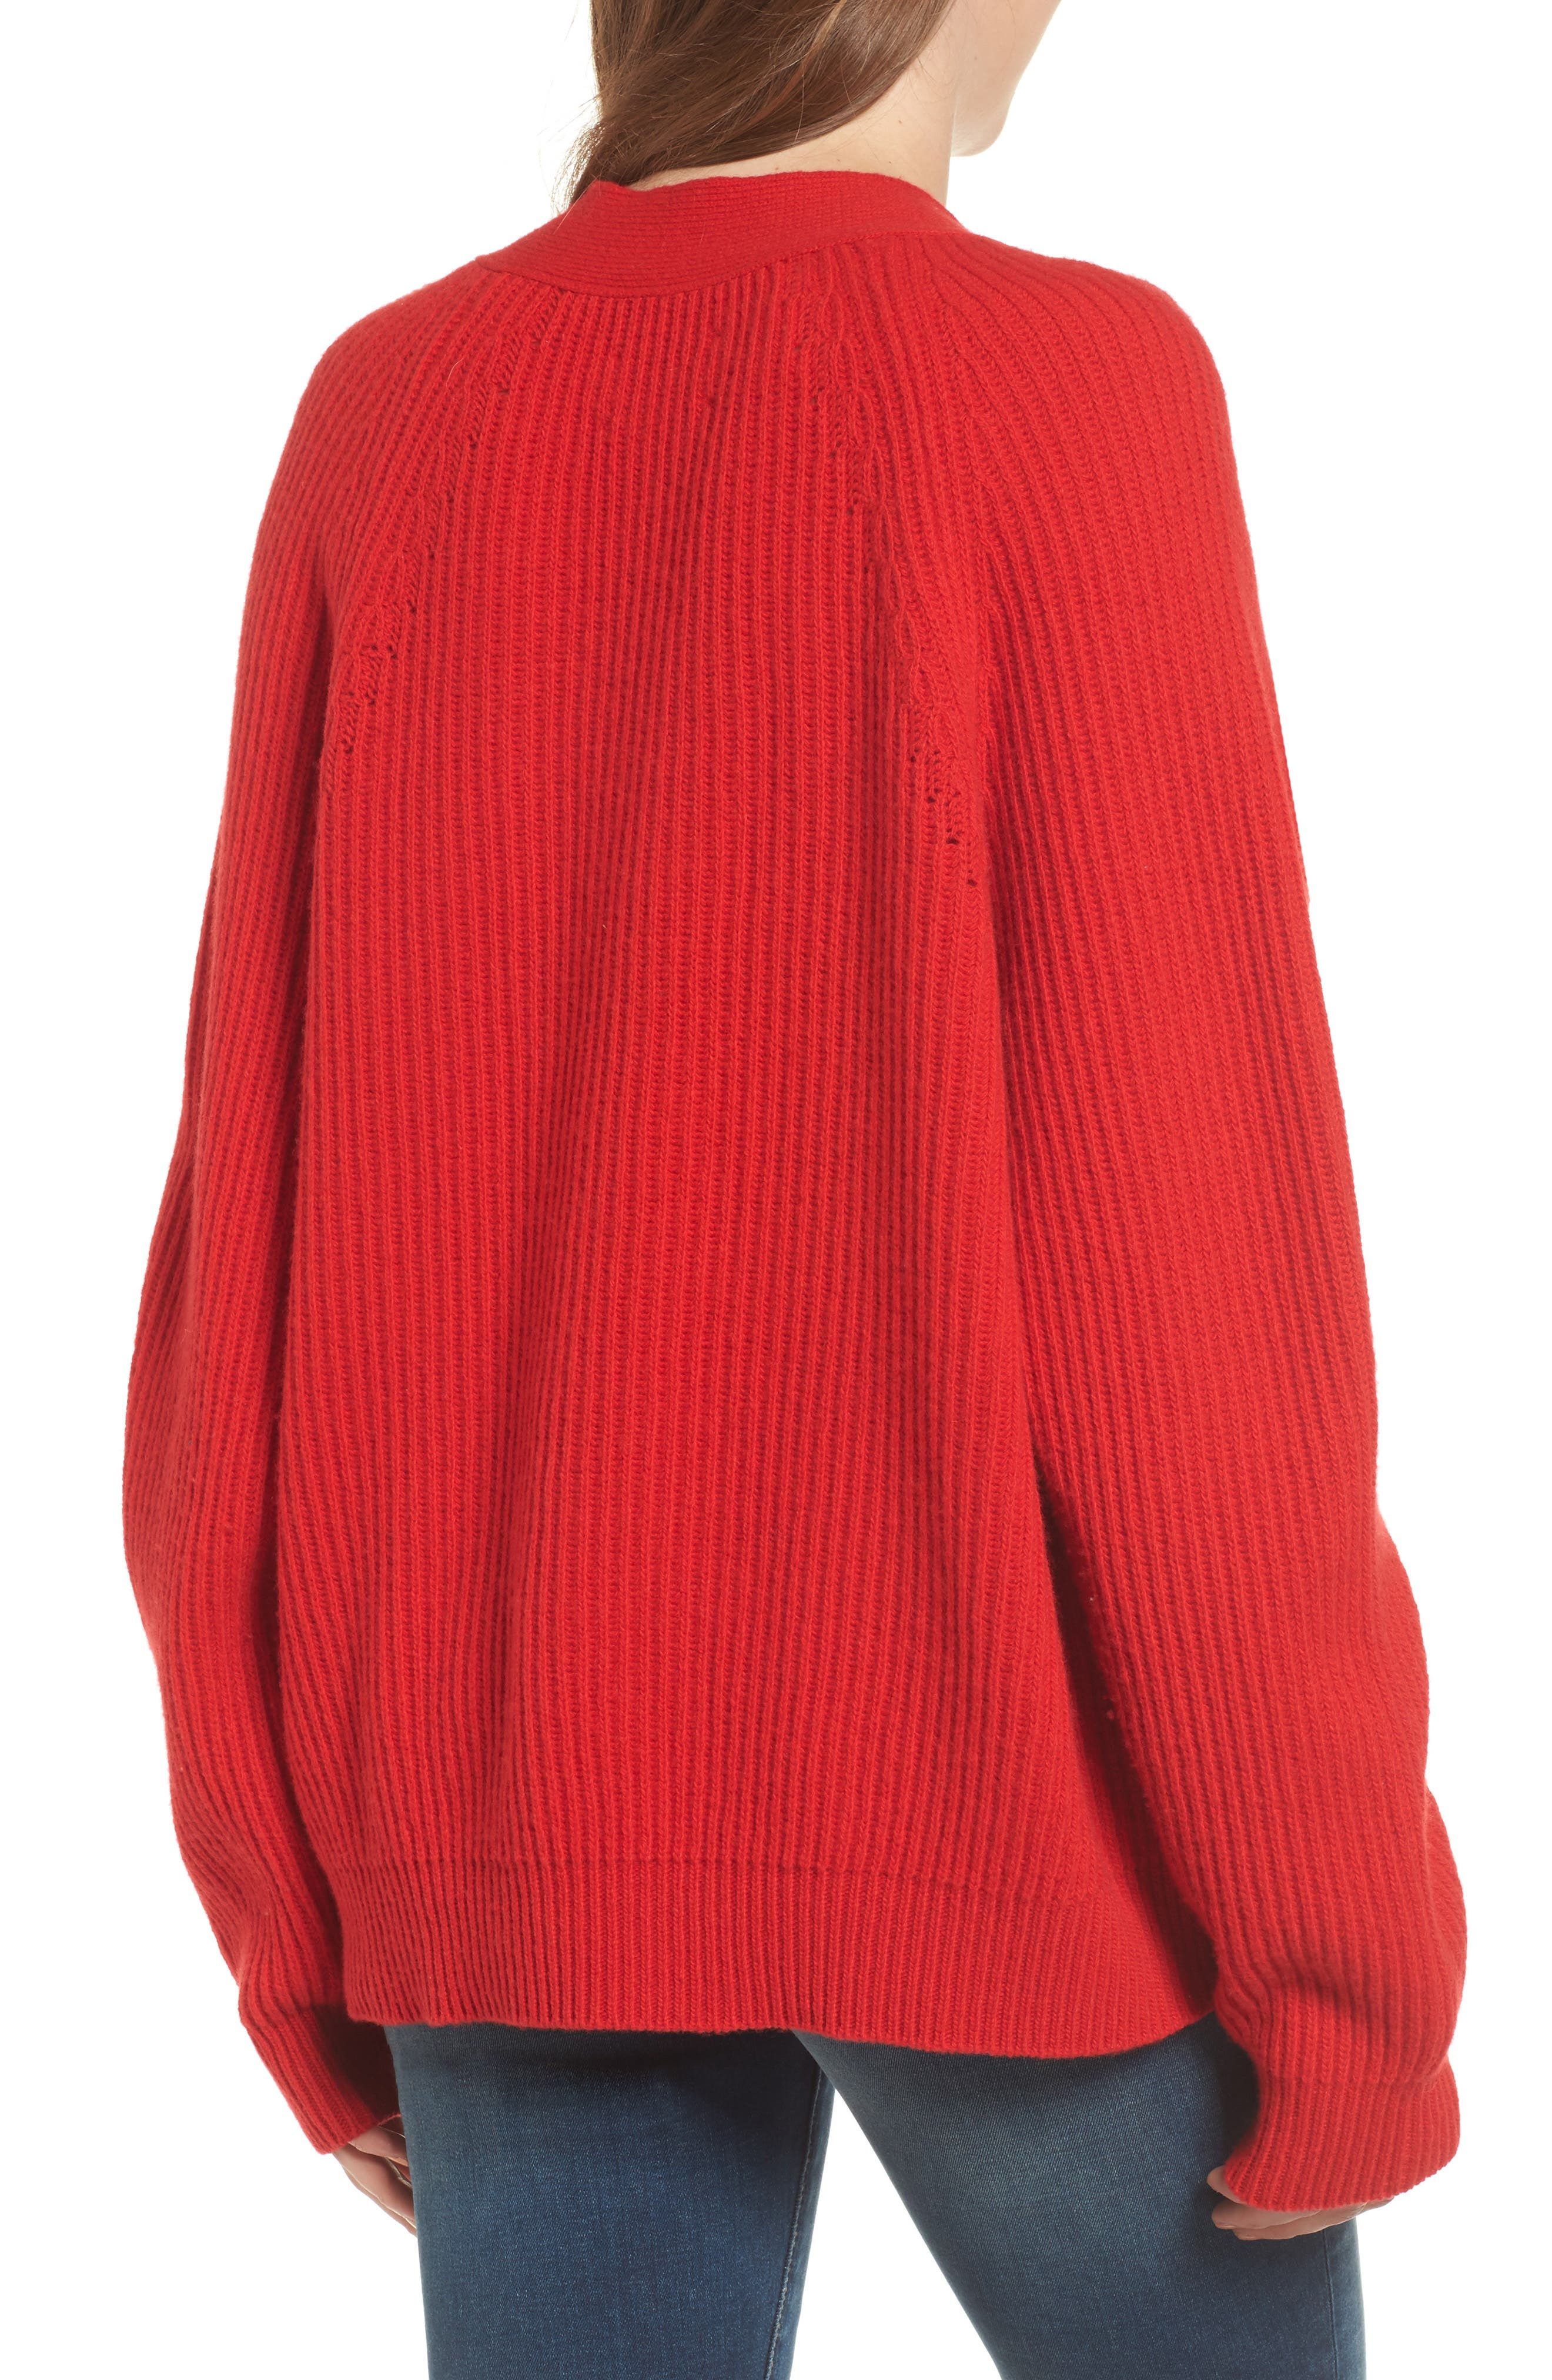 Kassy Wool Blend Sweater,                             Alternate thumbnail 2, color,                             600